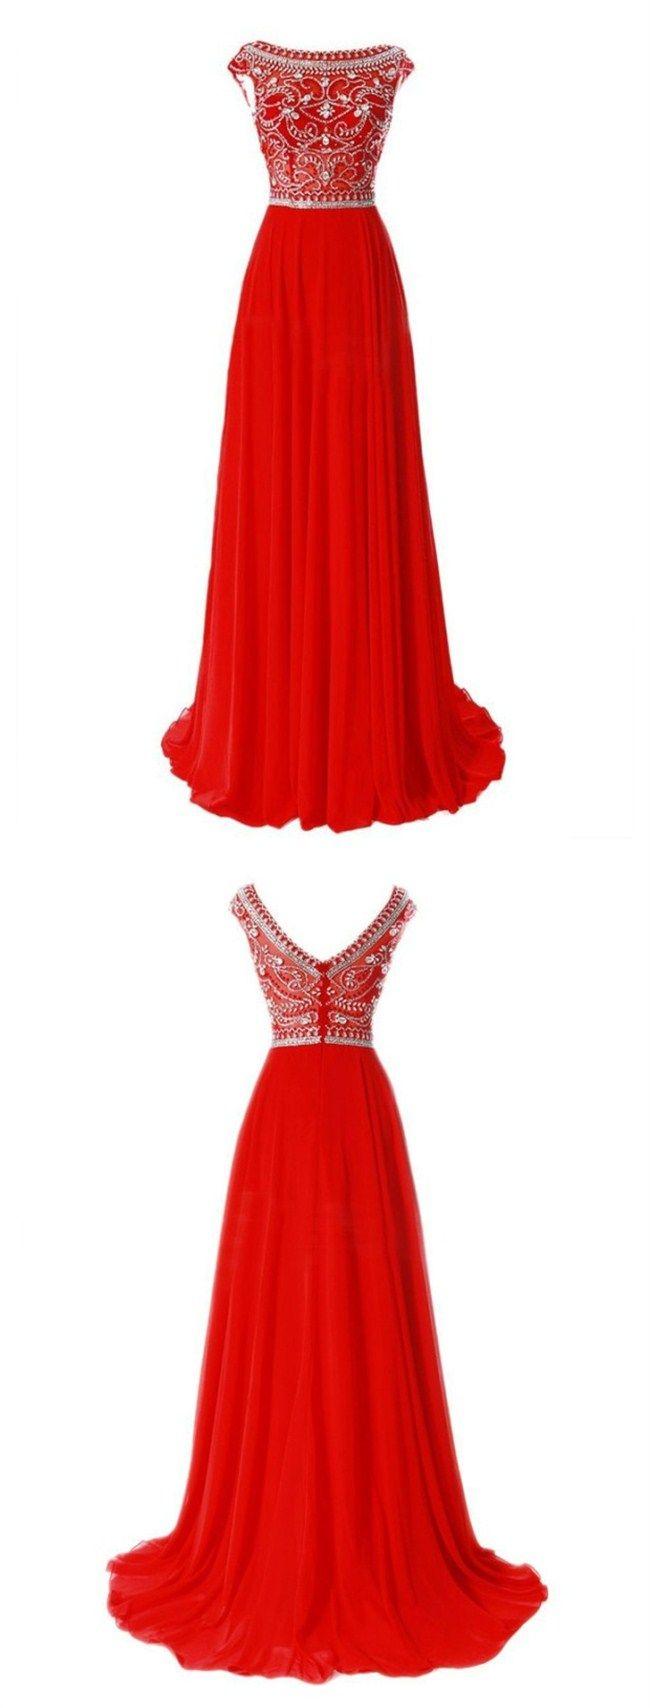 Red Prom Evening Dress , Elegant Beading Prom Dress, Bateau Cap Sleeves Prom Dress, Sweep Train Prom Evening Dress